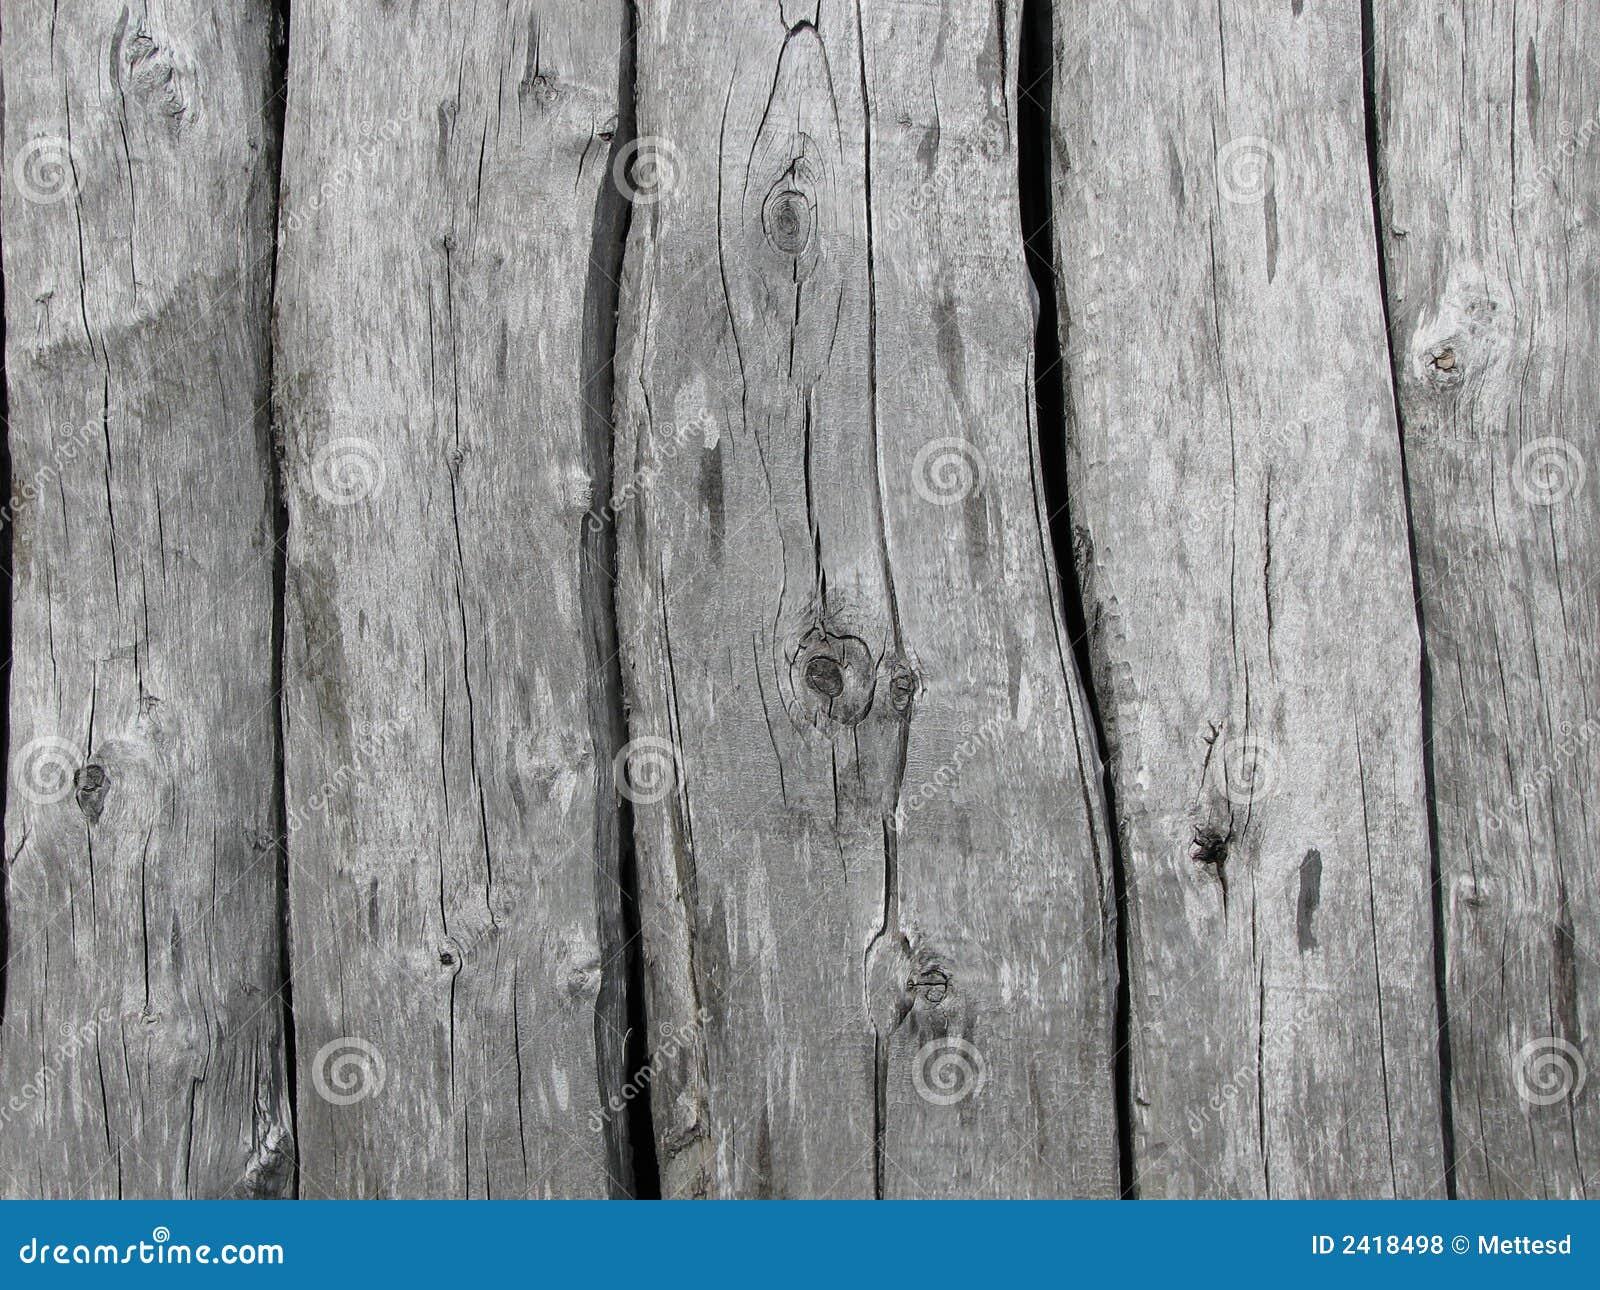 Weathered Wood Planks Royalty Free Stock Photos Image